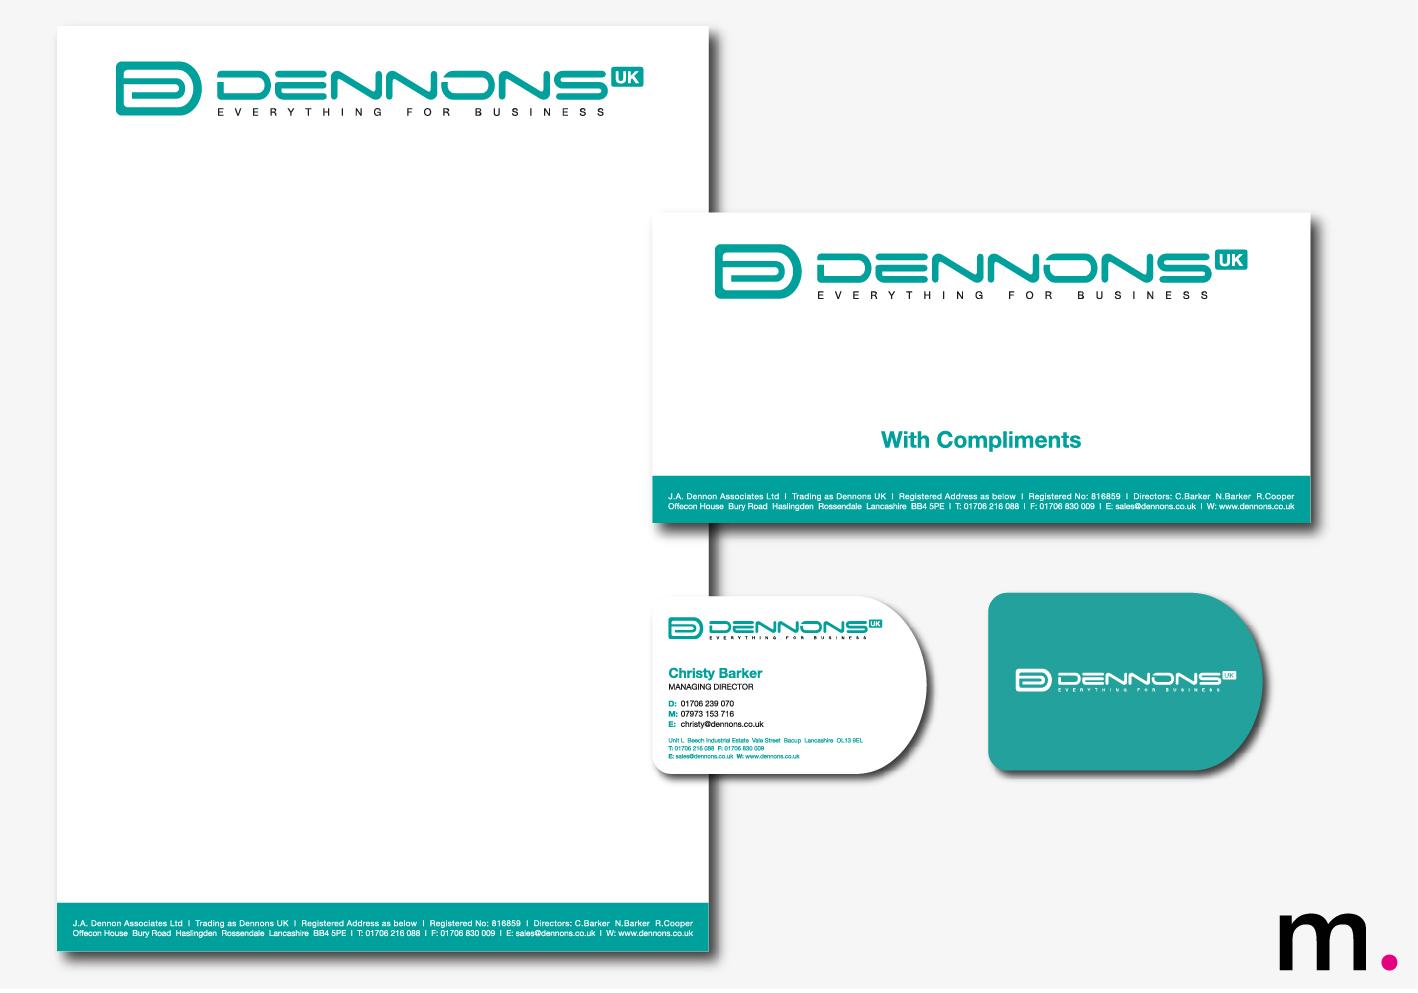 Dennons_New Spreads-07.jpg